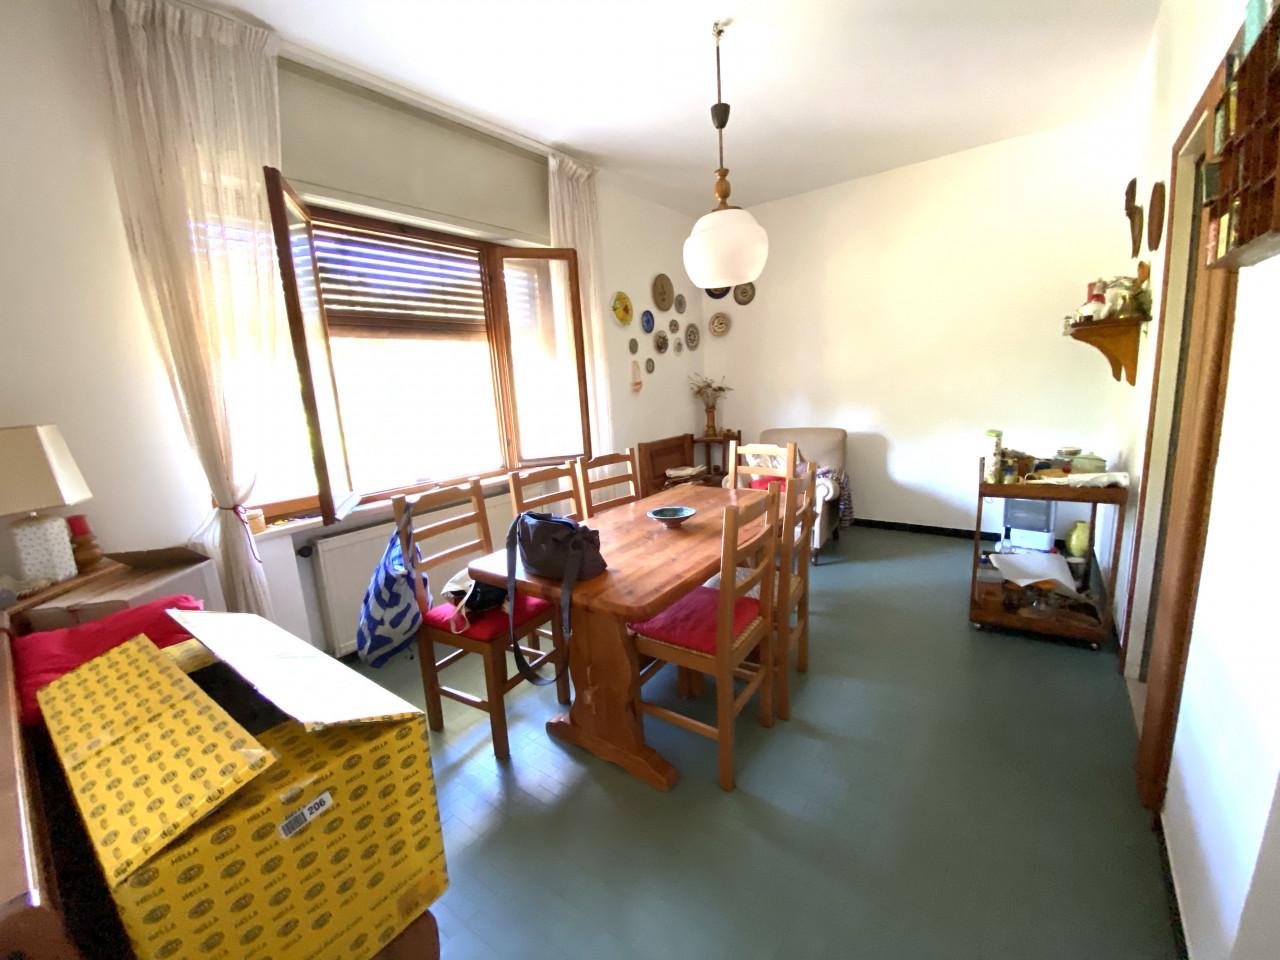 Casa singola con capannone in vendita in centro a Budoia - Rif. V.D.1 https://images.gestionaleimmobiliare.it/foto/annunci/200702/2265893/1280x1280/004__img_2976.jpg